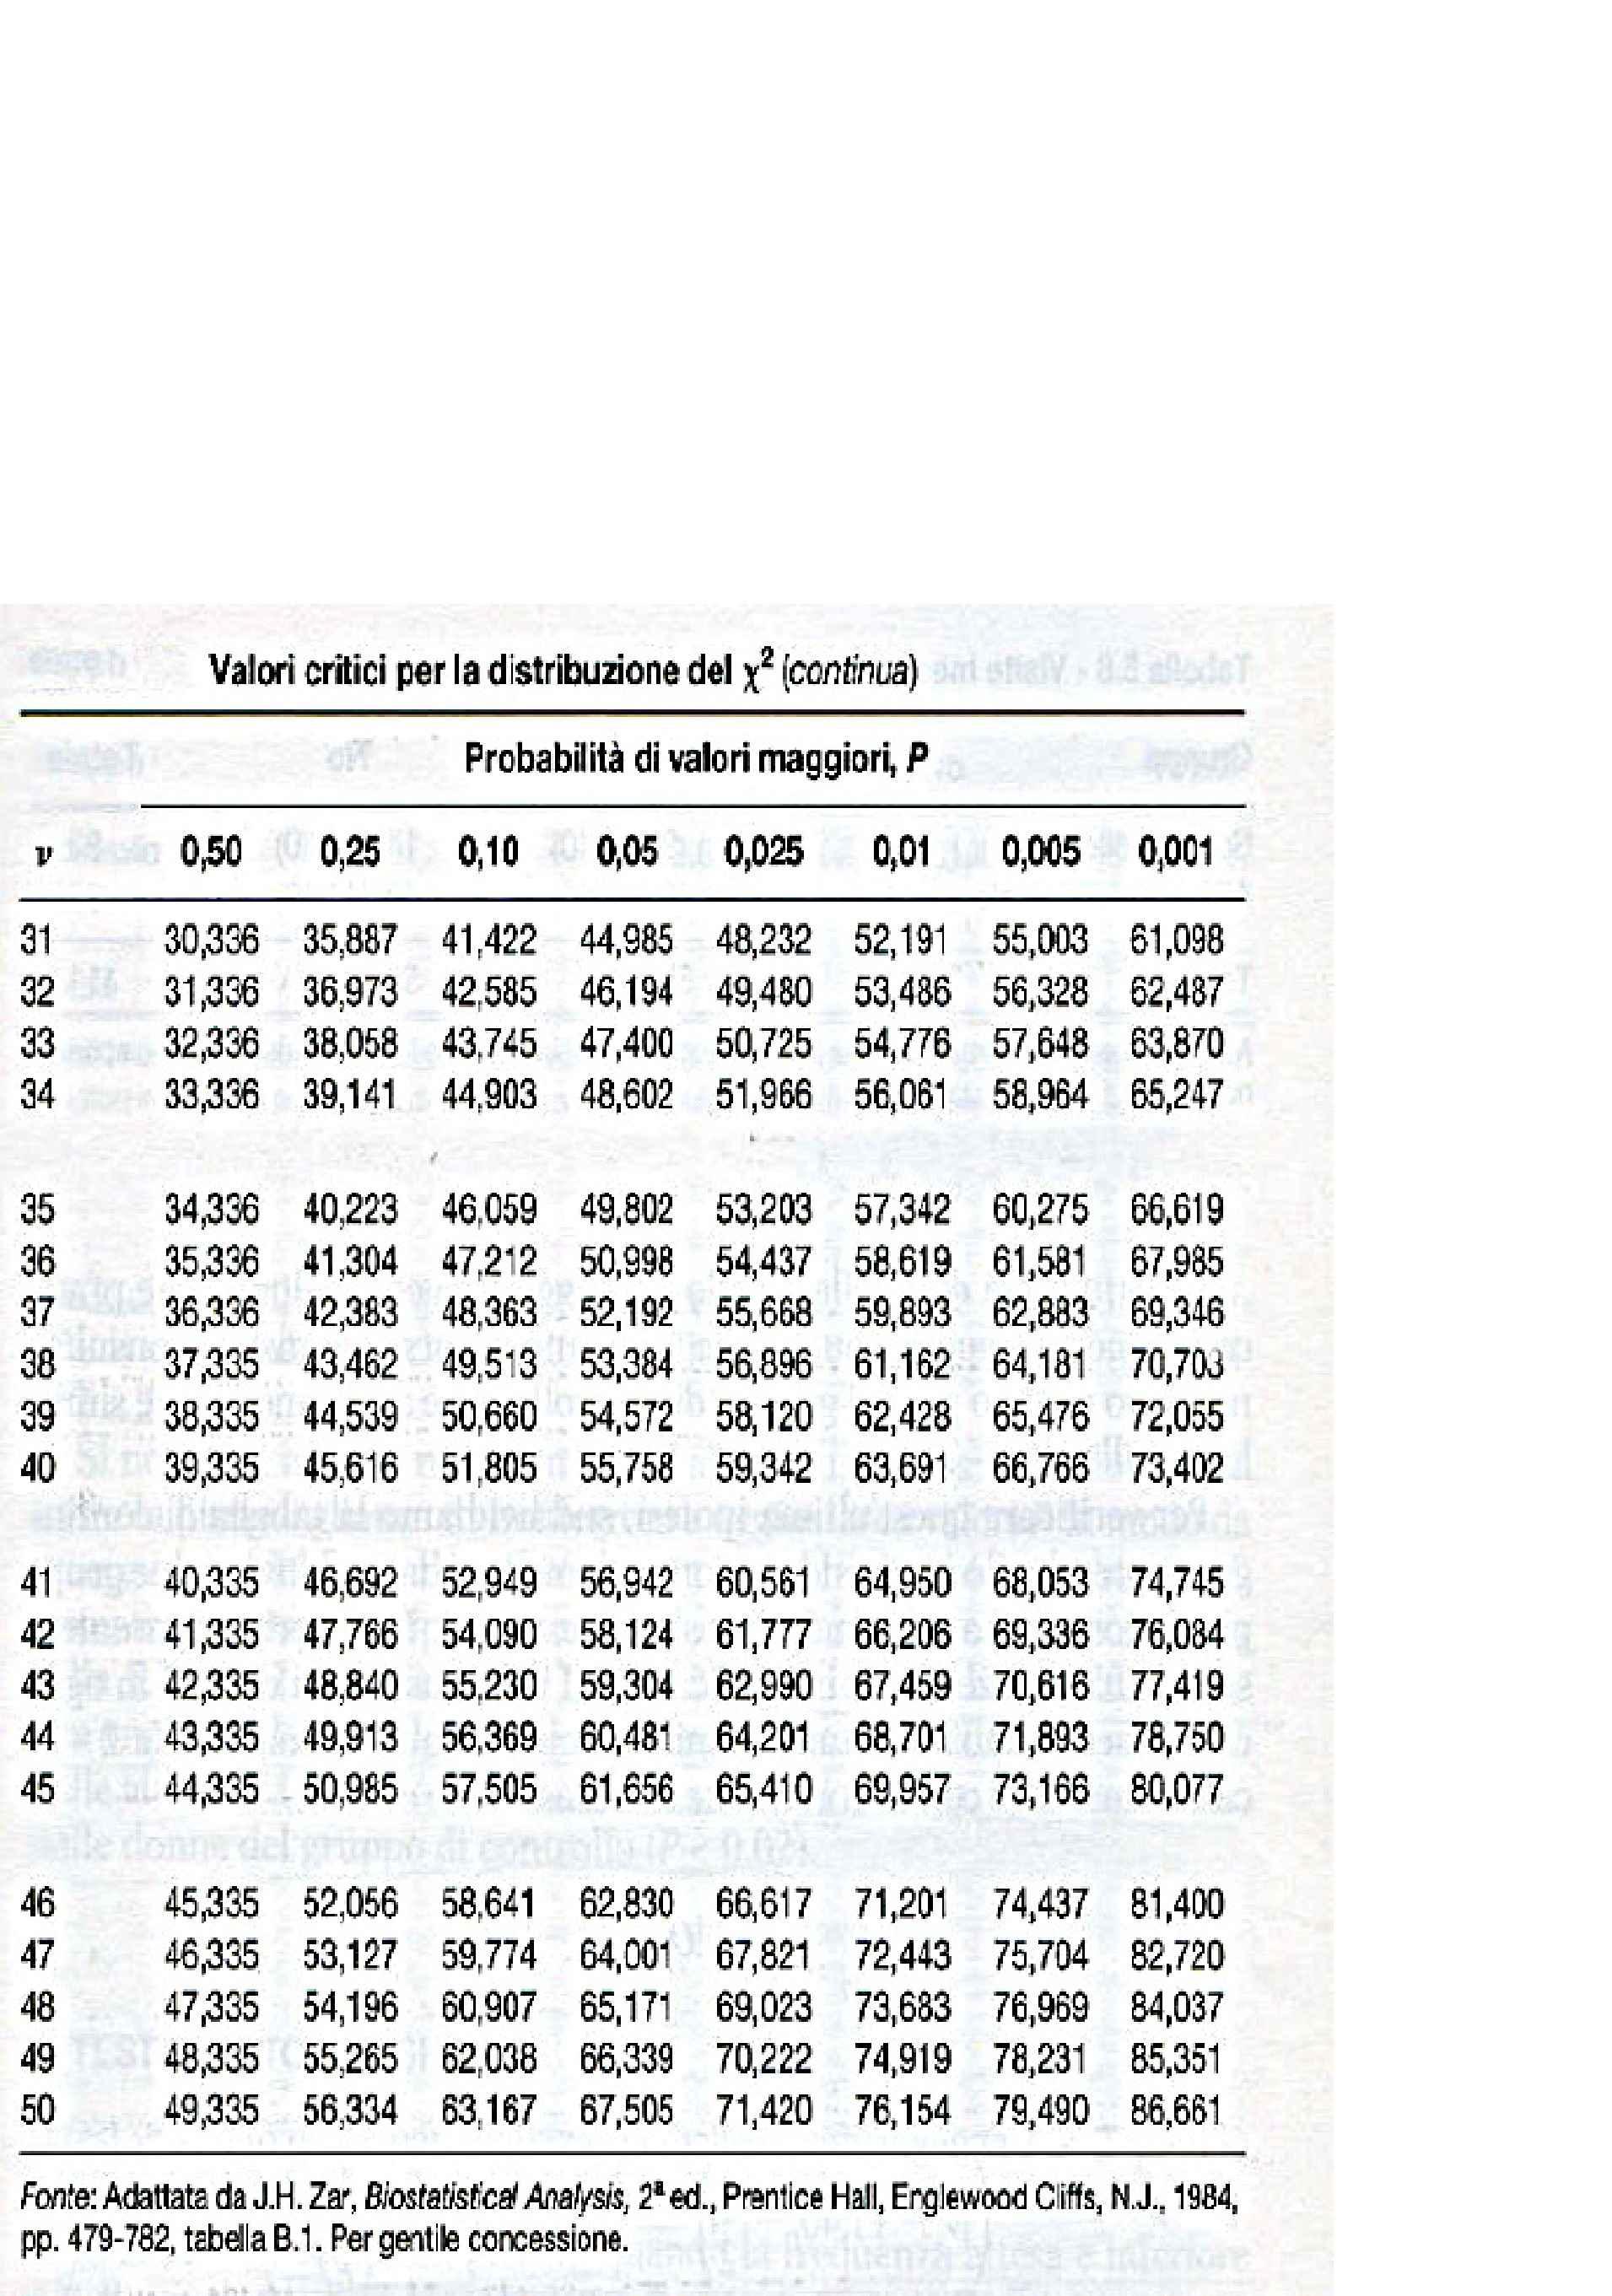 Statistica - tavole statistiche - Dispensa